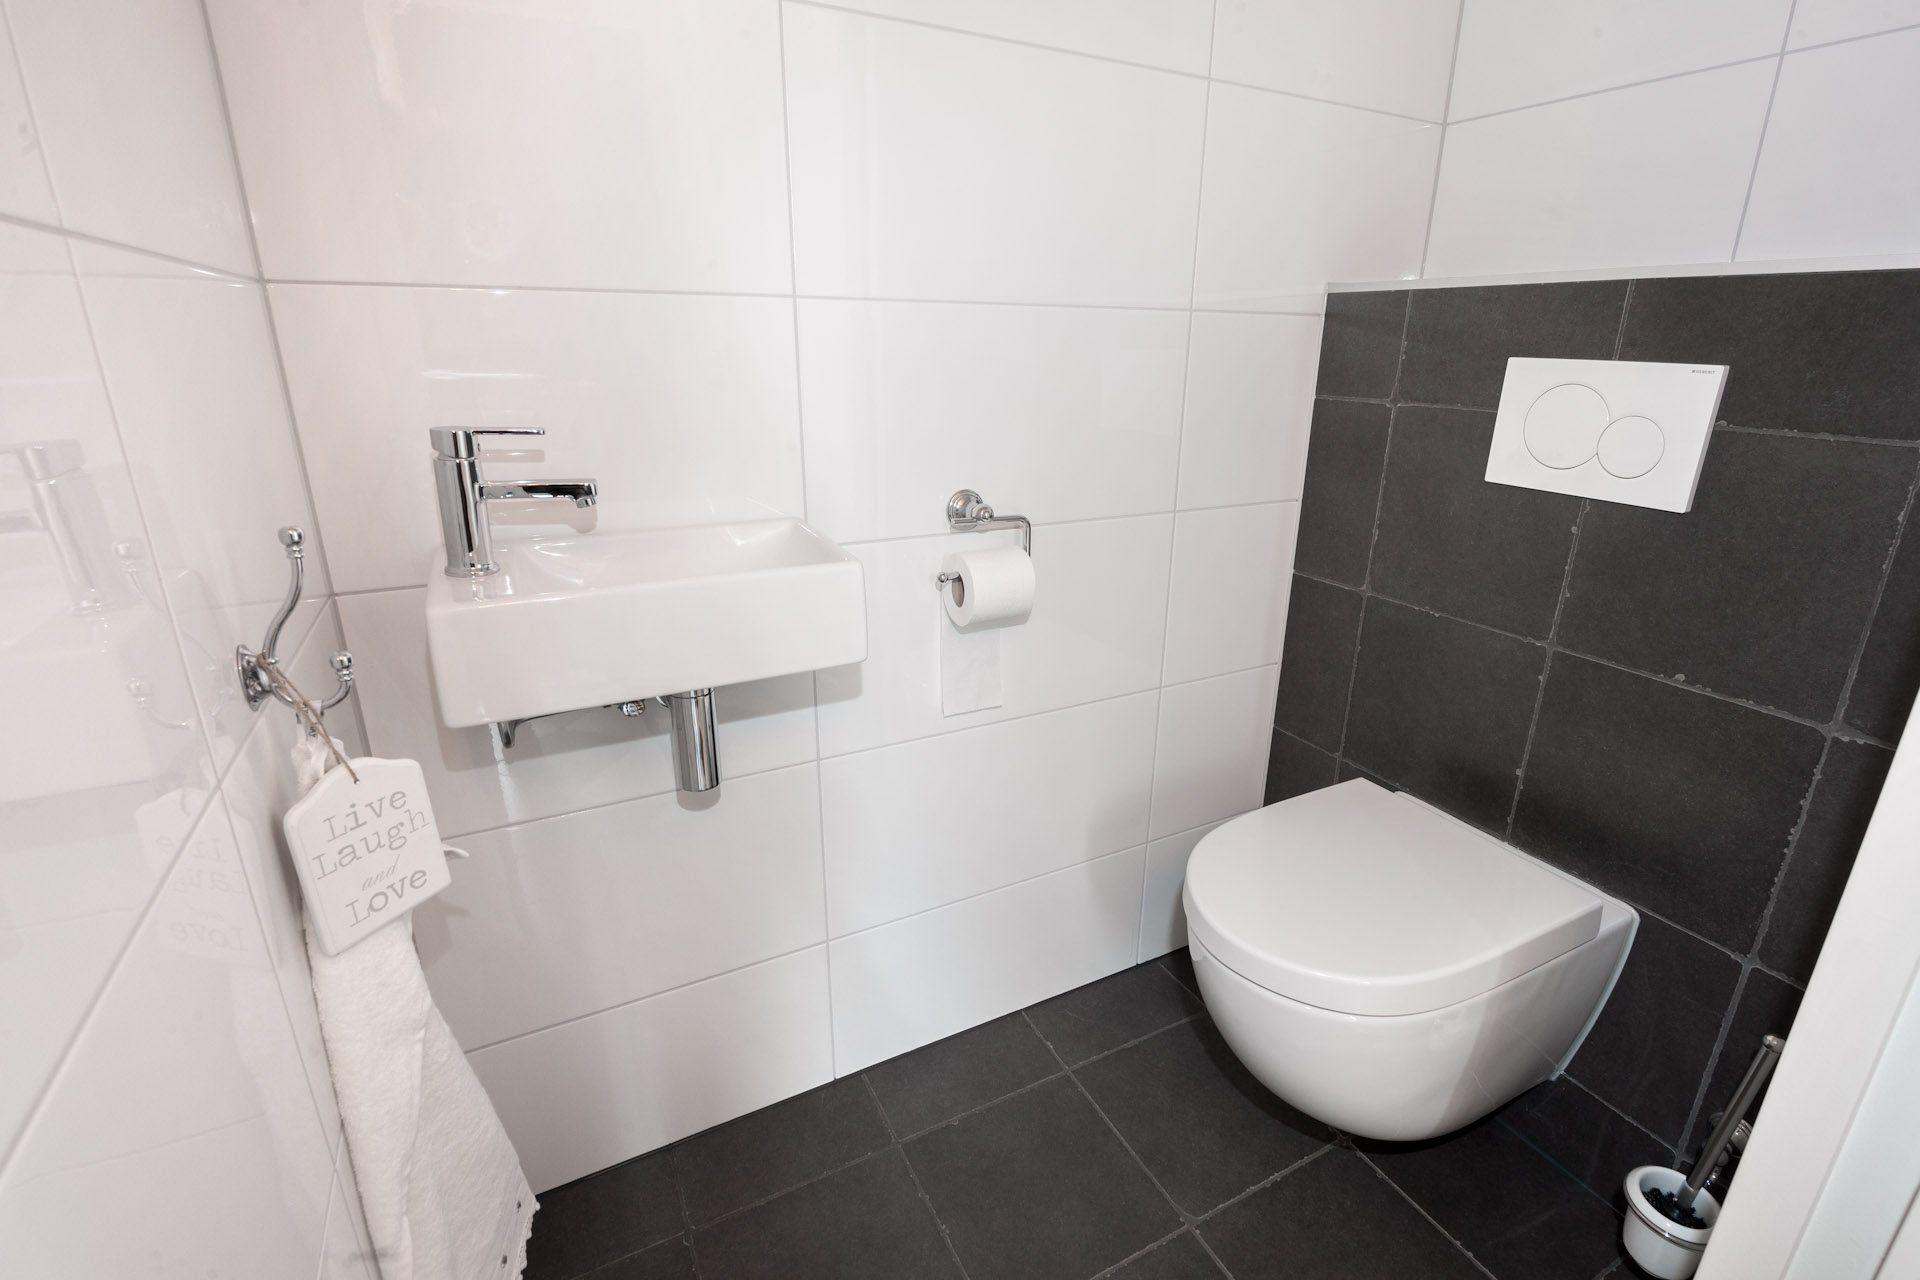 Houtlook tegels in woonkamer, zwart/wit geblokte vloer in hal